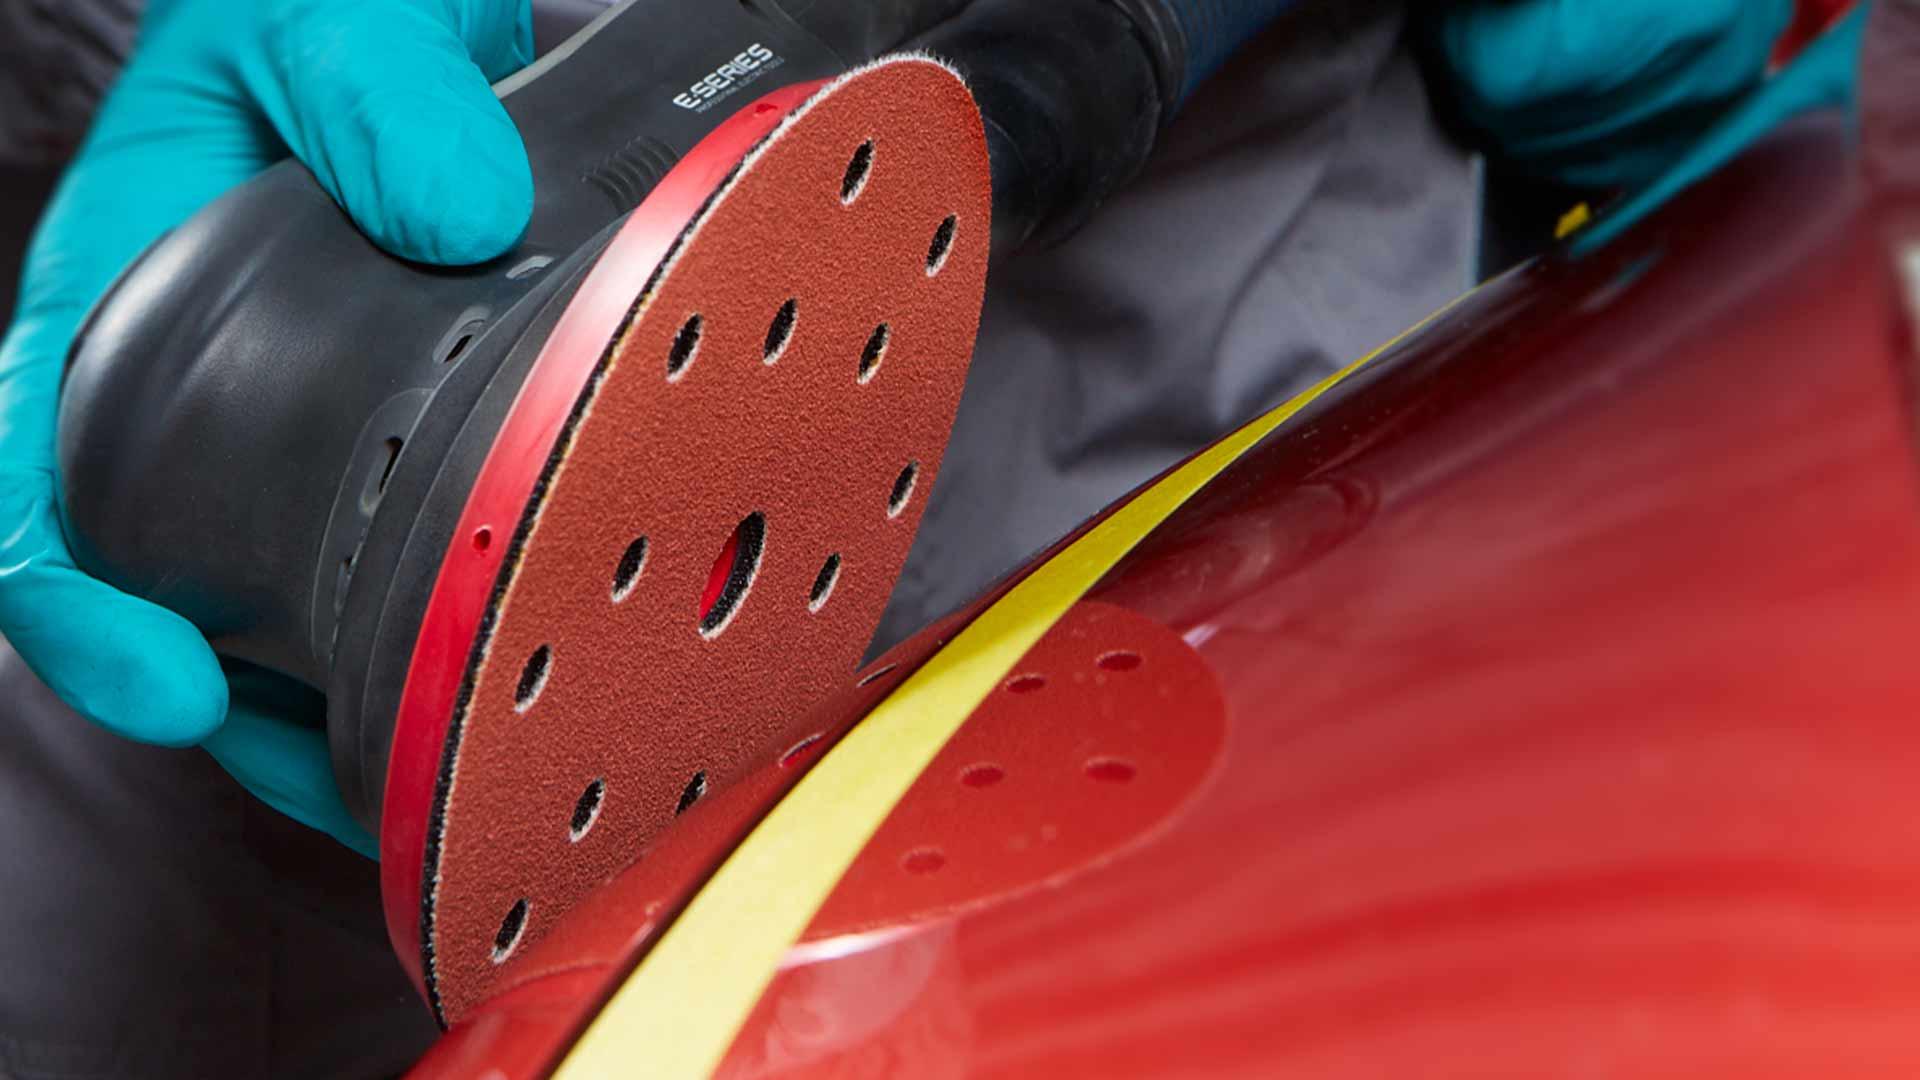 INDASA Abrasives Rhynogrip Red Line sanding red surface